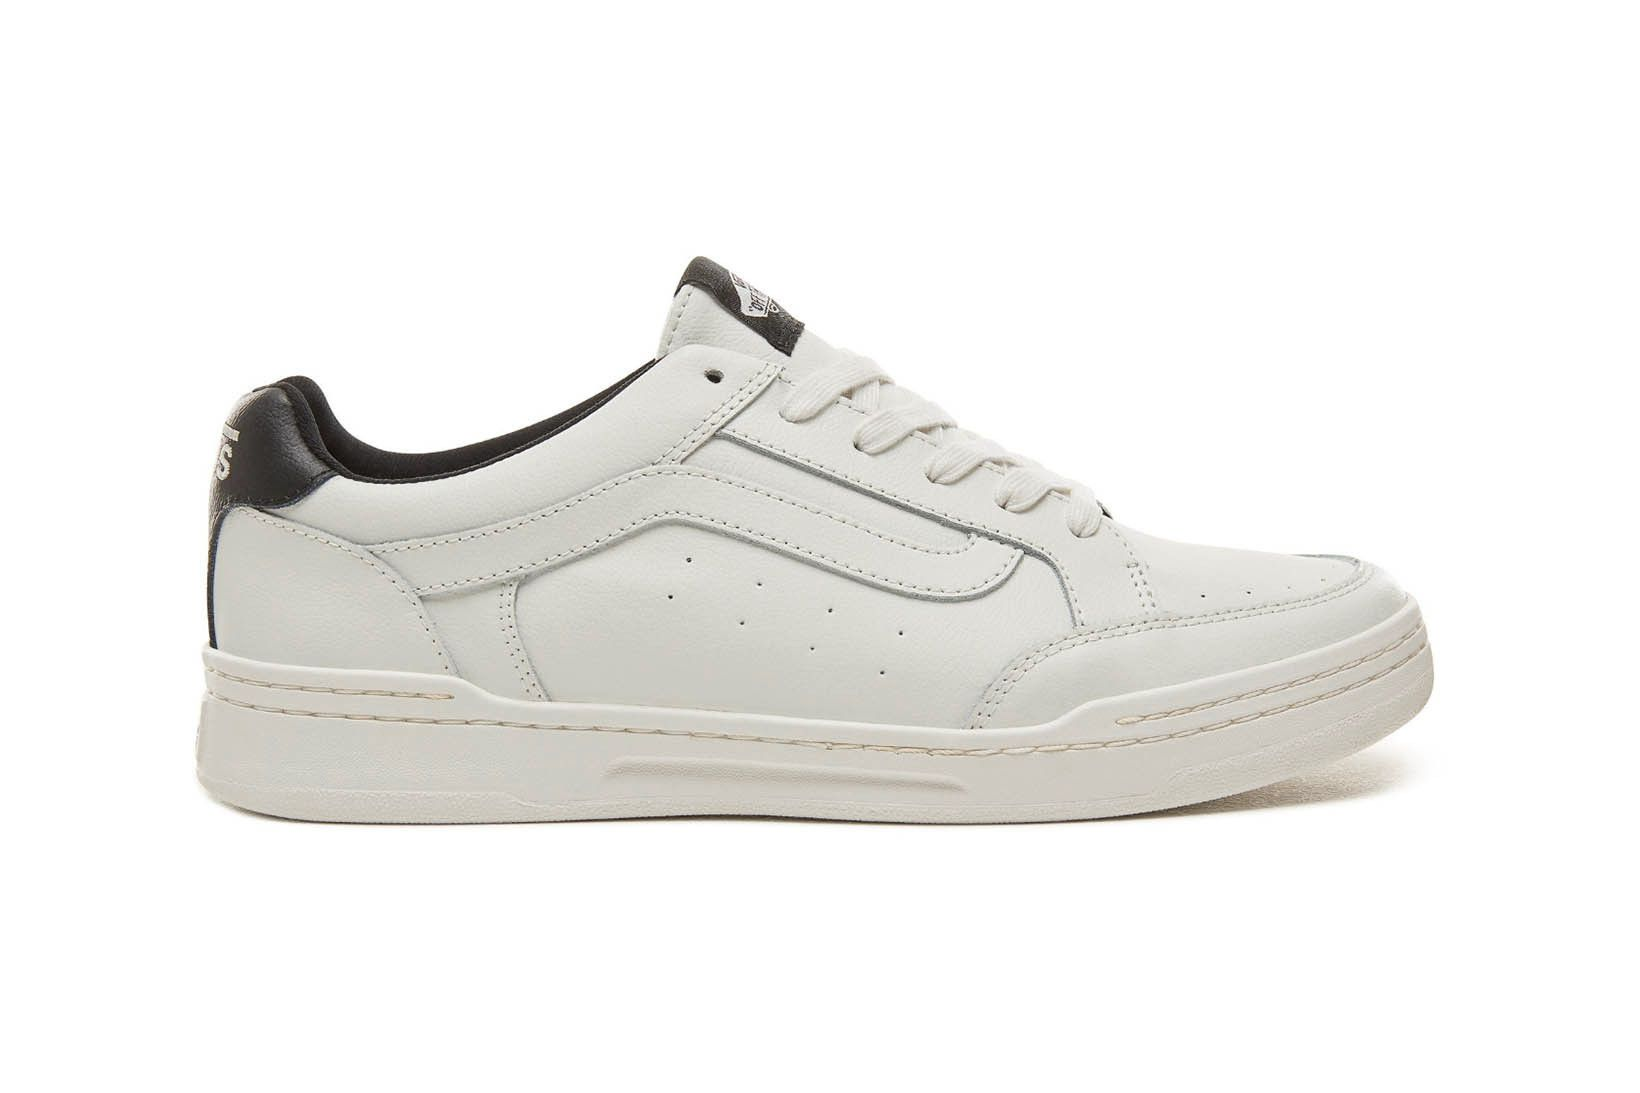 Vans Sporty Highland Pink Zephyr White Sneakers 2 Sneaker Freaker1